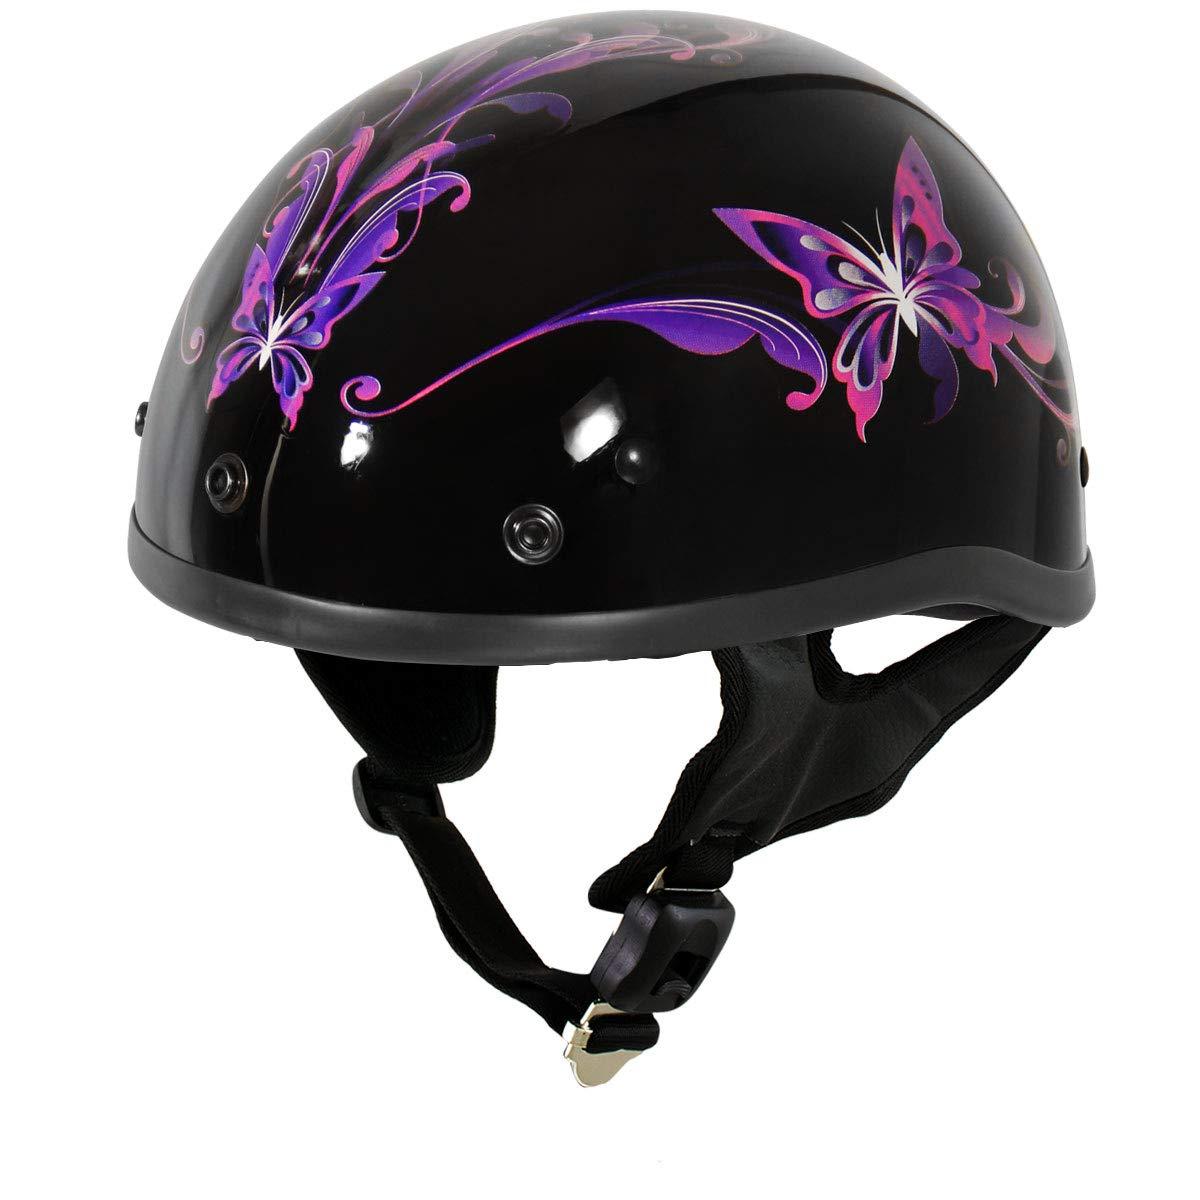 Medium Outlaw T70 Purple Butterfly Advanced DOT Glossy Black Motorcycle Half Helmet